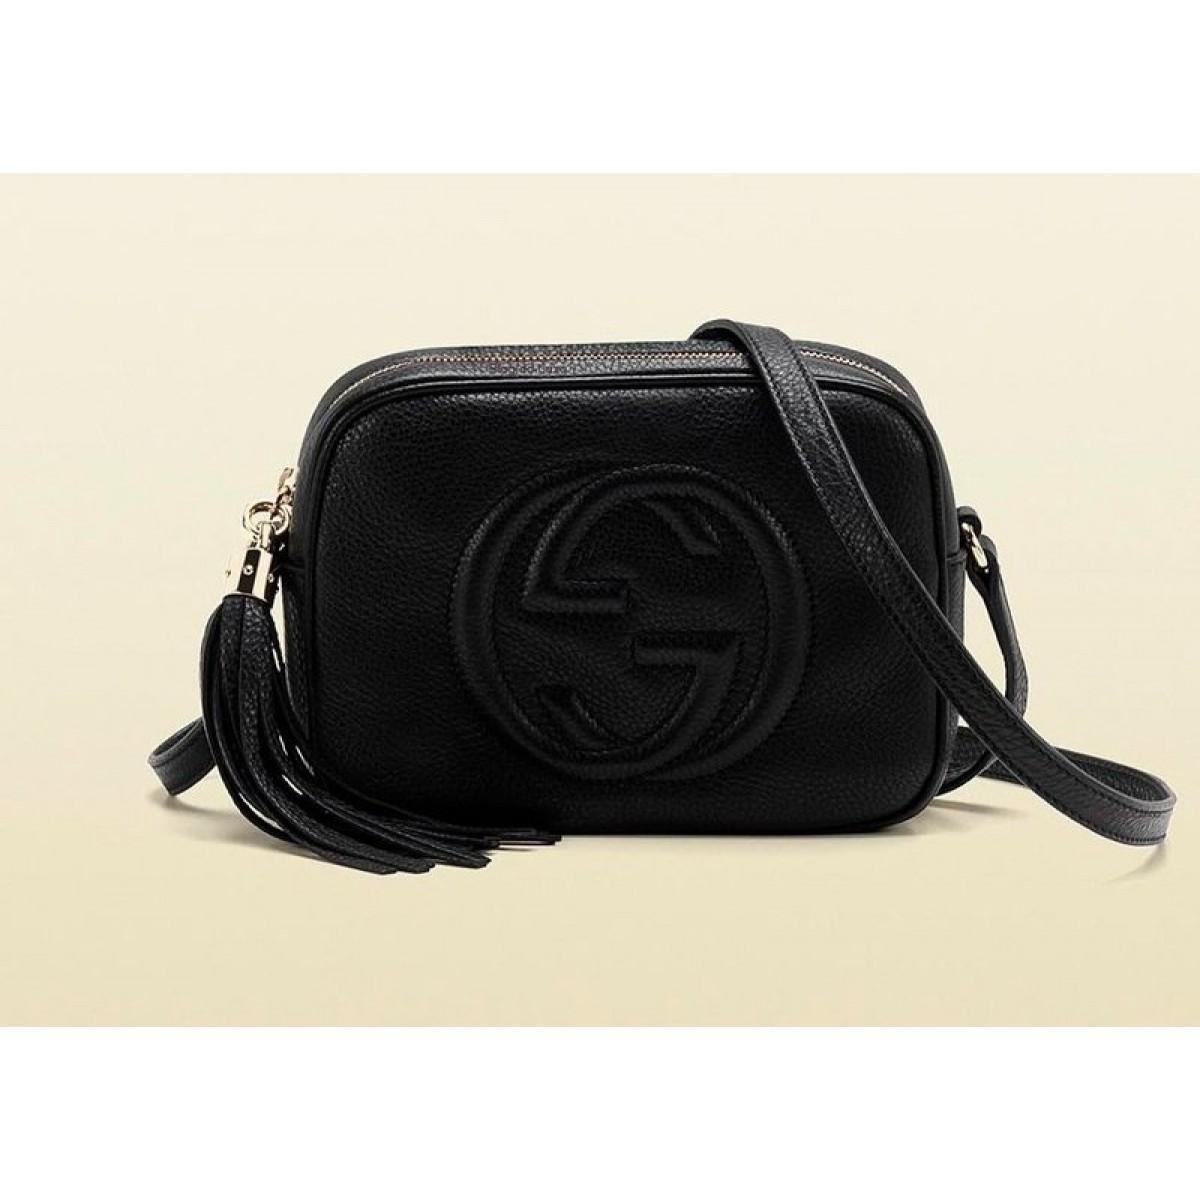 Bolsa Gucci Pequena Inspired : R?plica de bolsa gucci soho disco preta